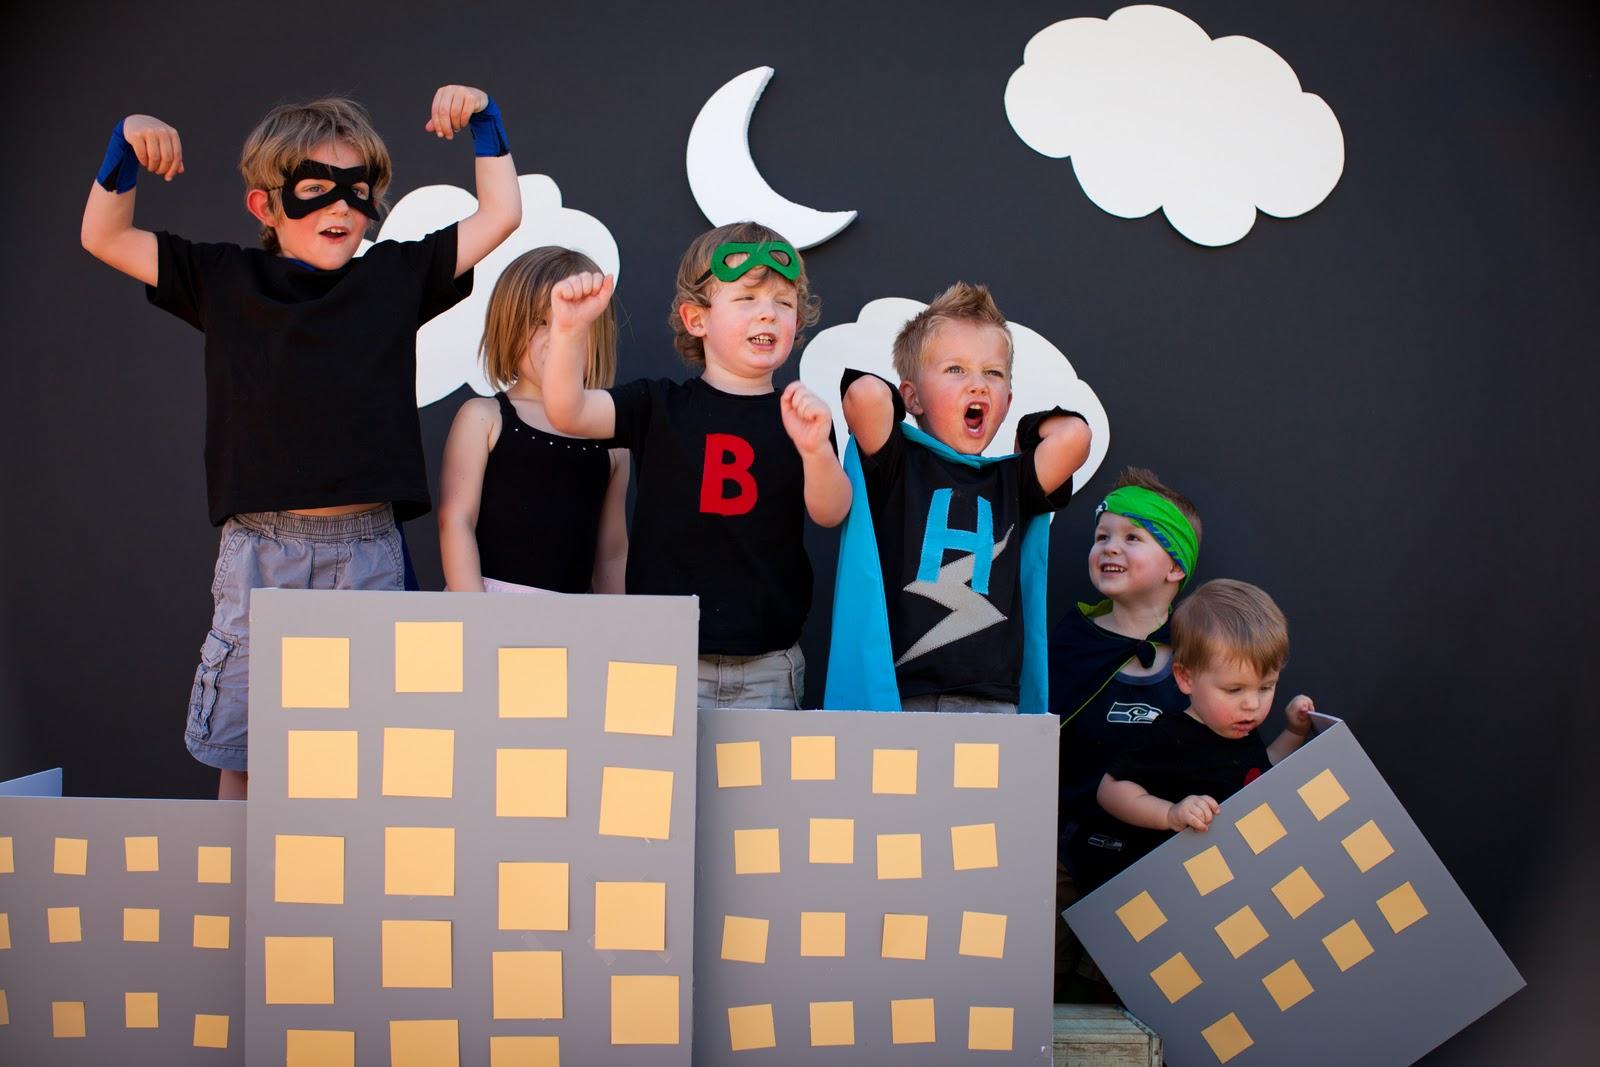 super hero party photo backdrop.jpg